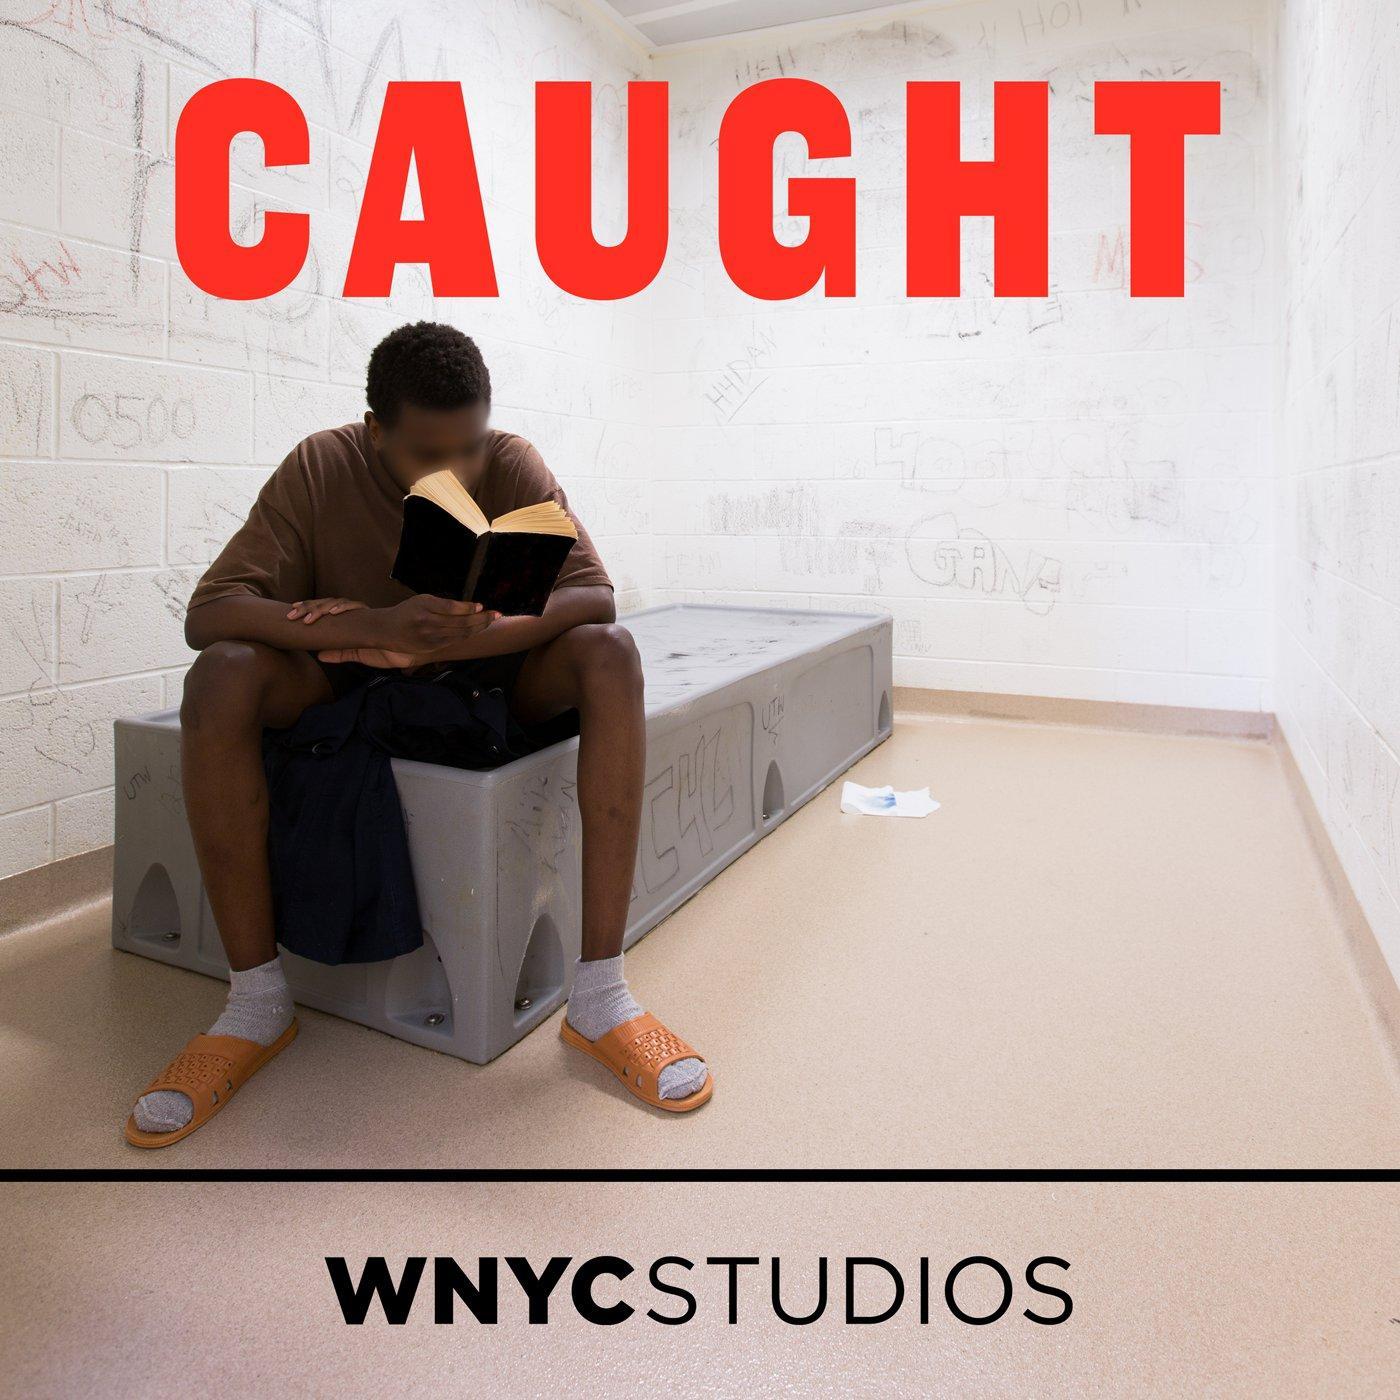 Caught_WNYCStudios_q85.jpg